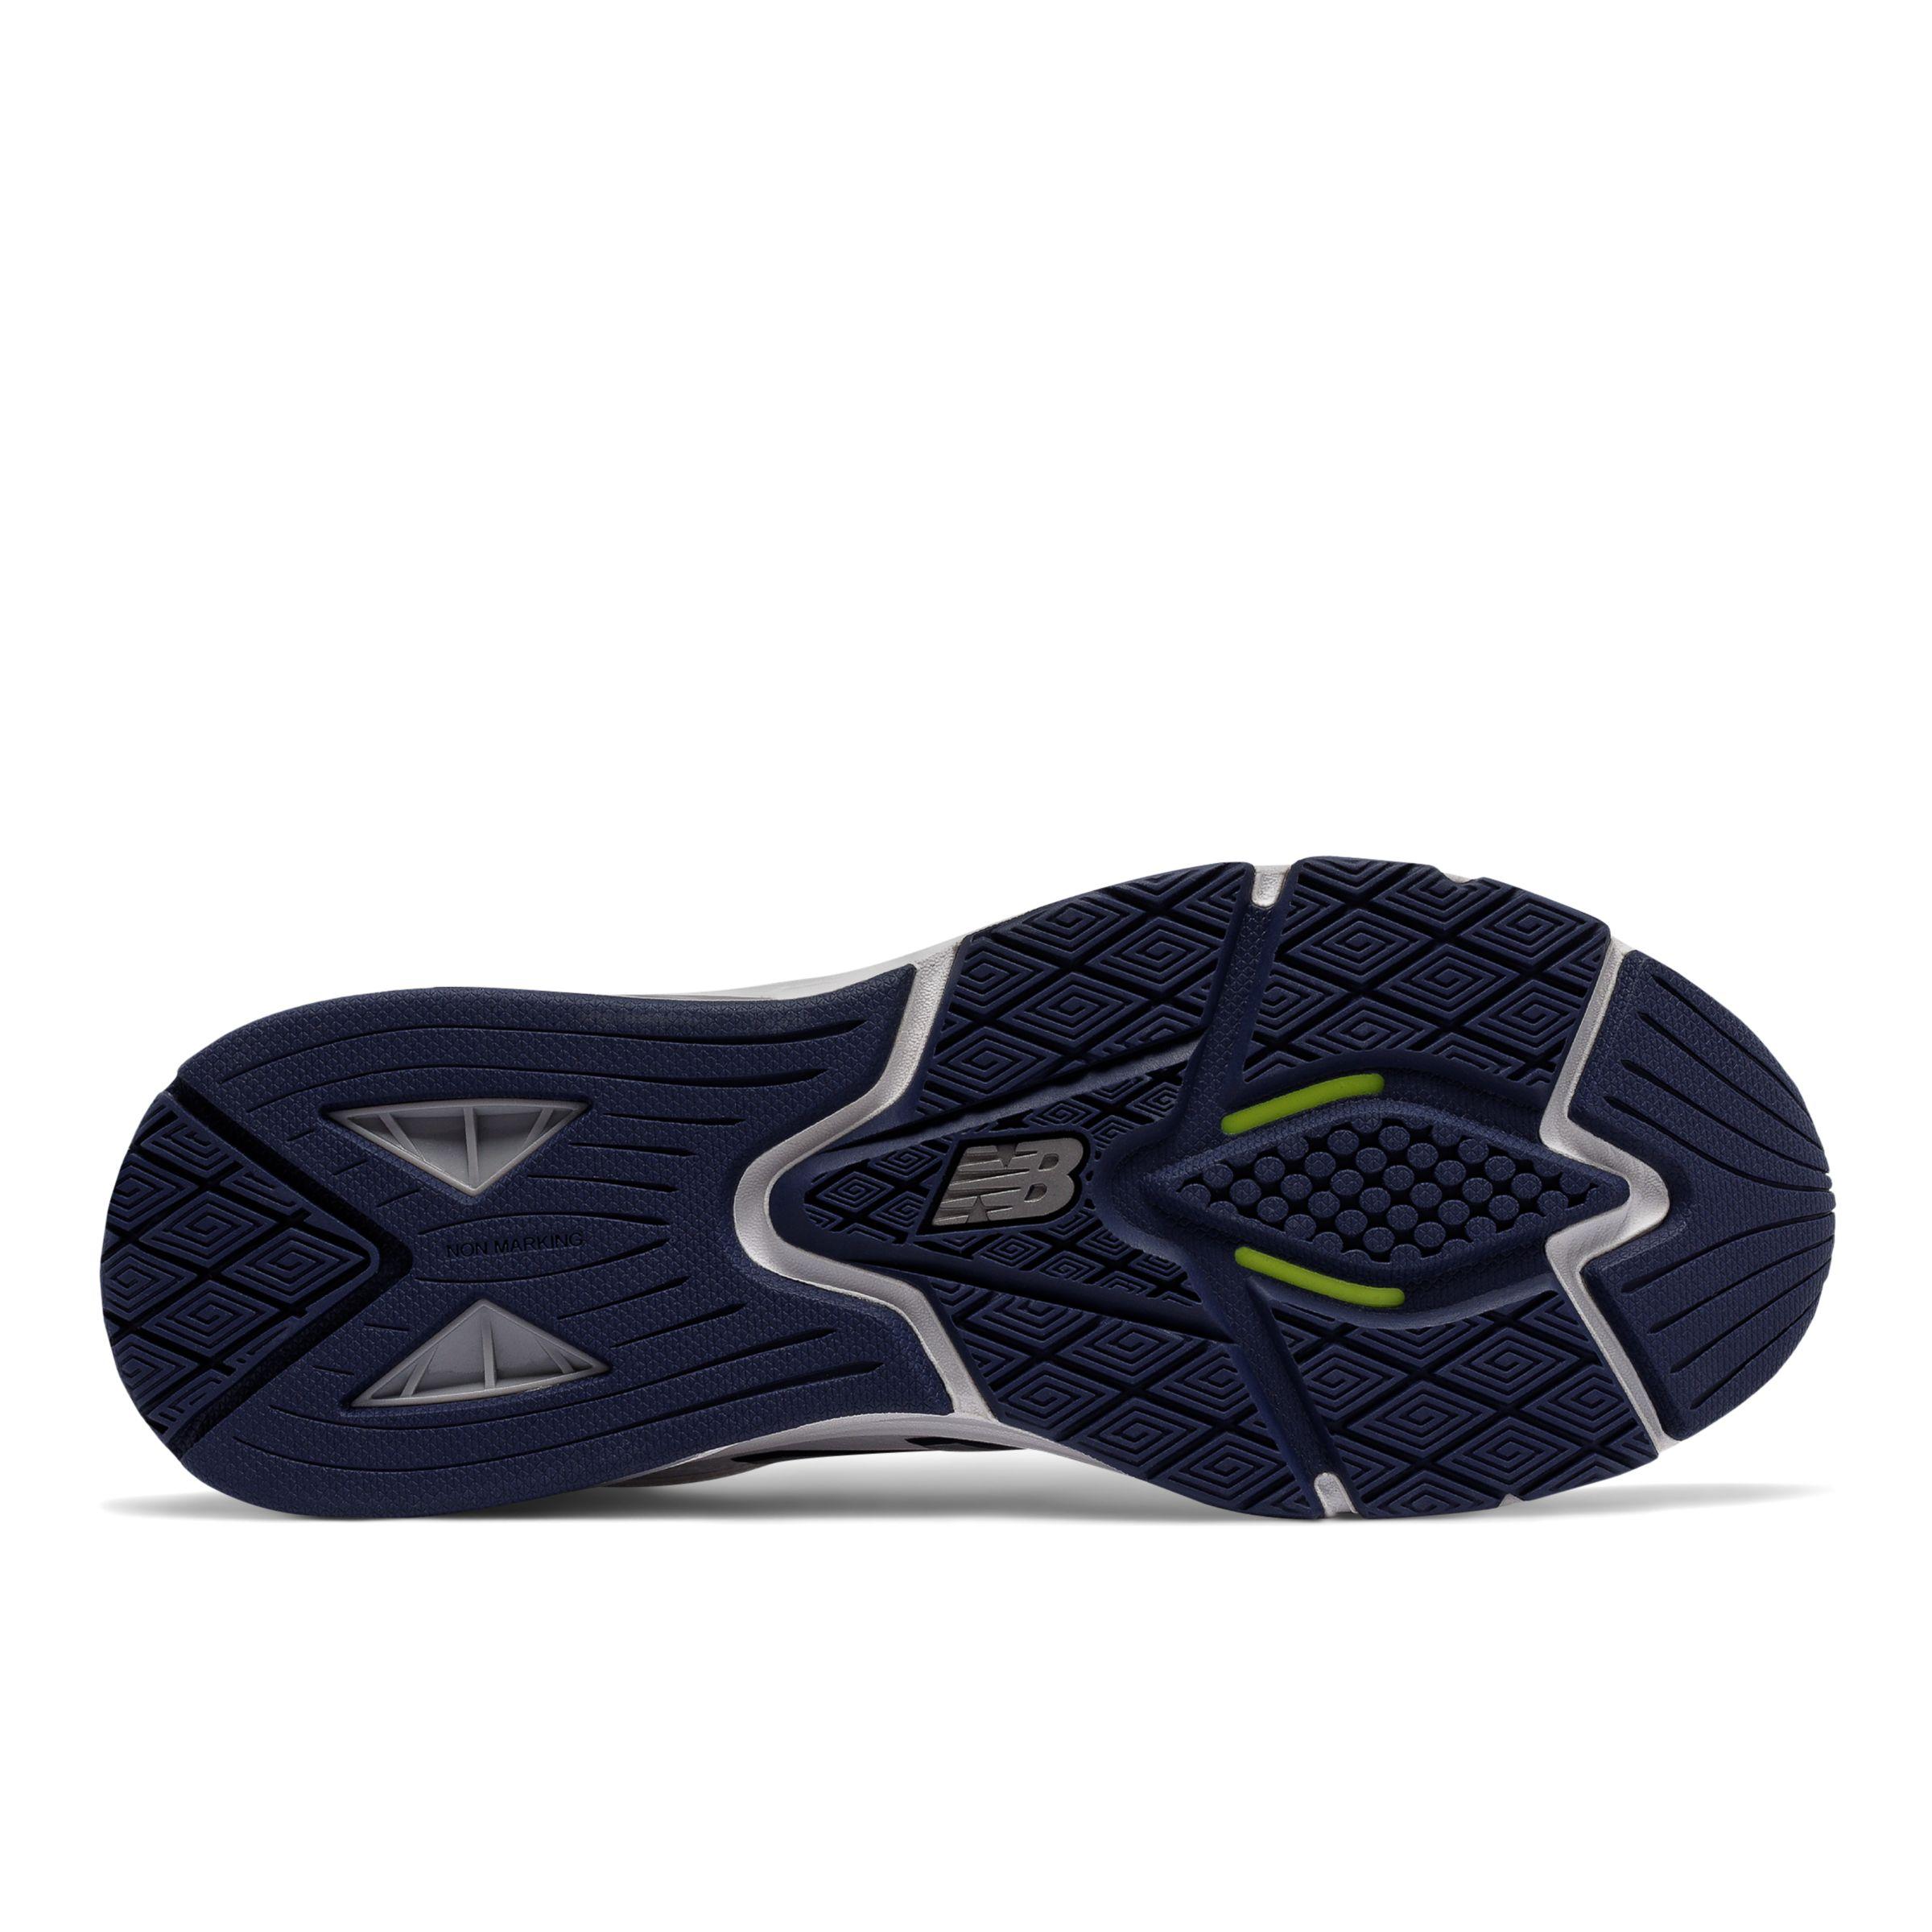 thumbnail 12 - New-Balance-857v2-Men-039-s-Running-Training-Shoes